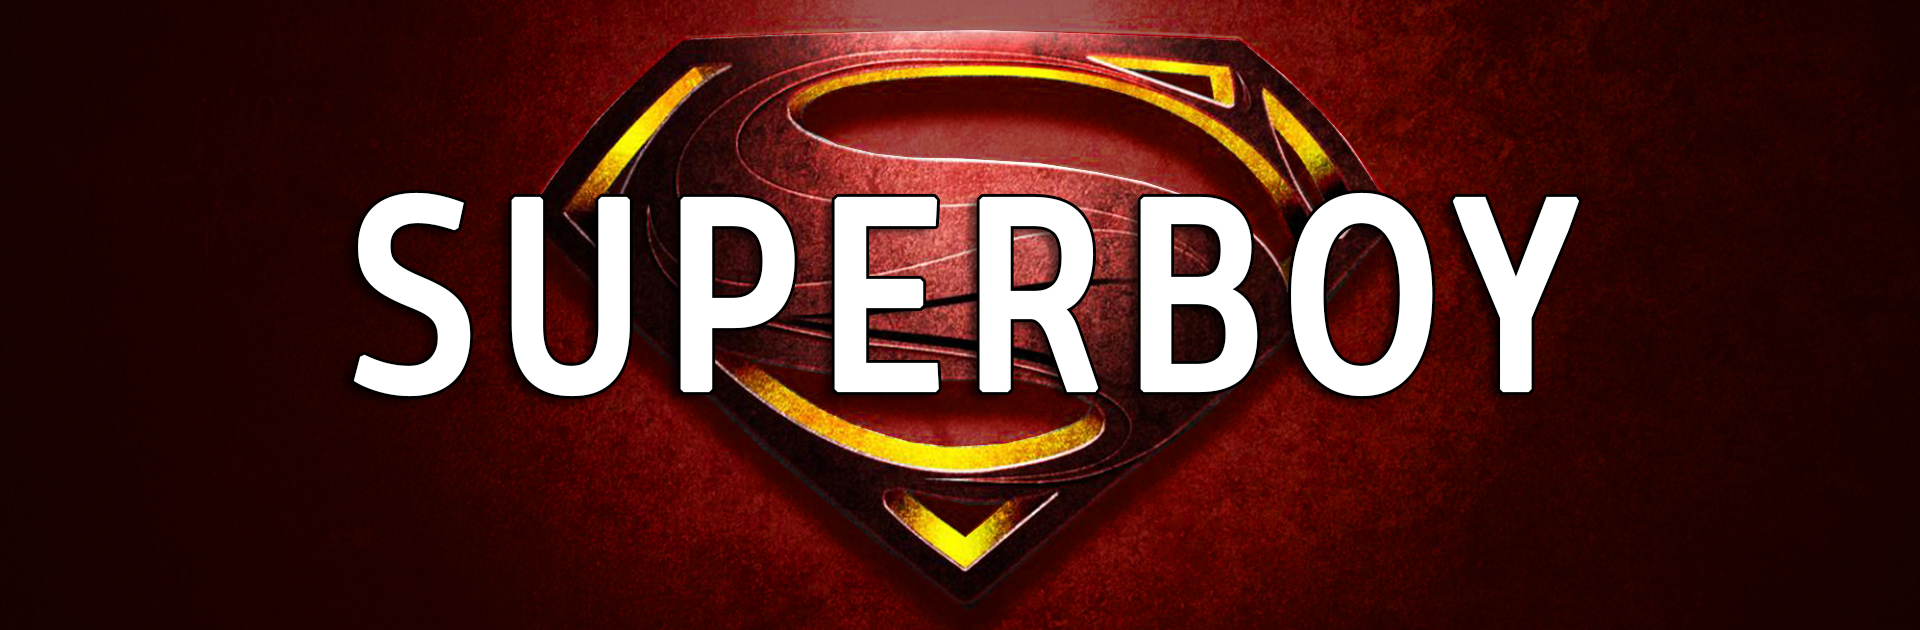 MINI BANNER - 03 Superboy.jpg